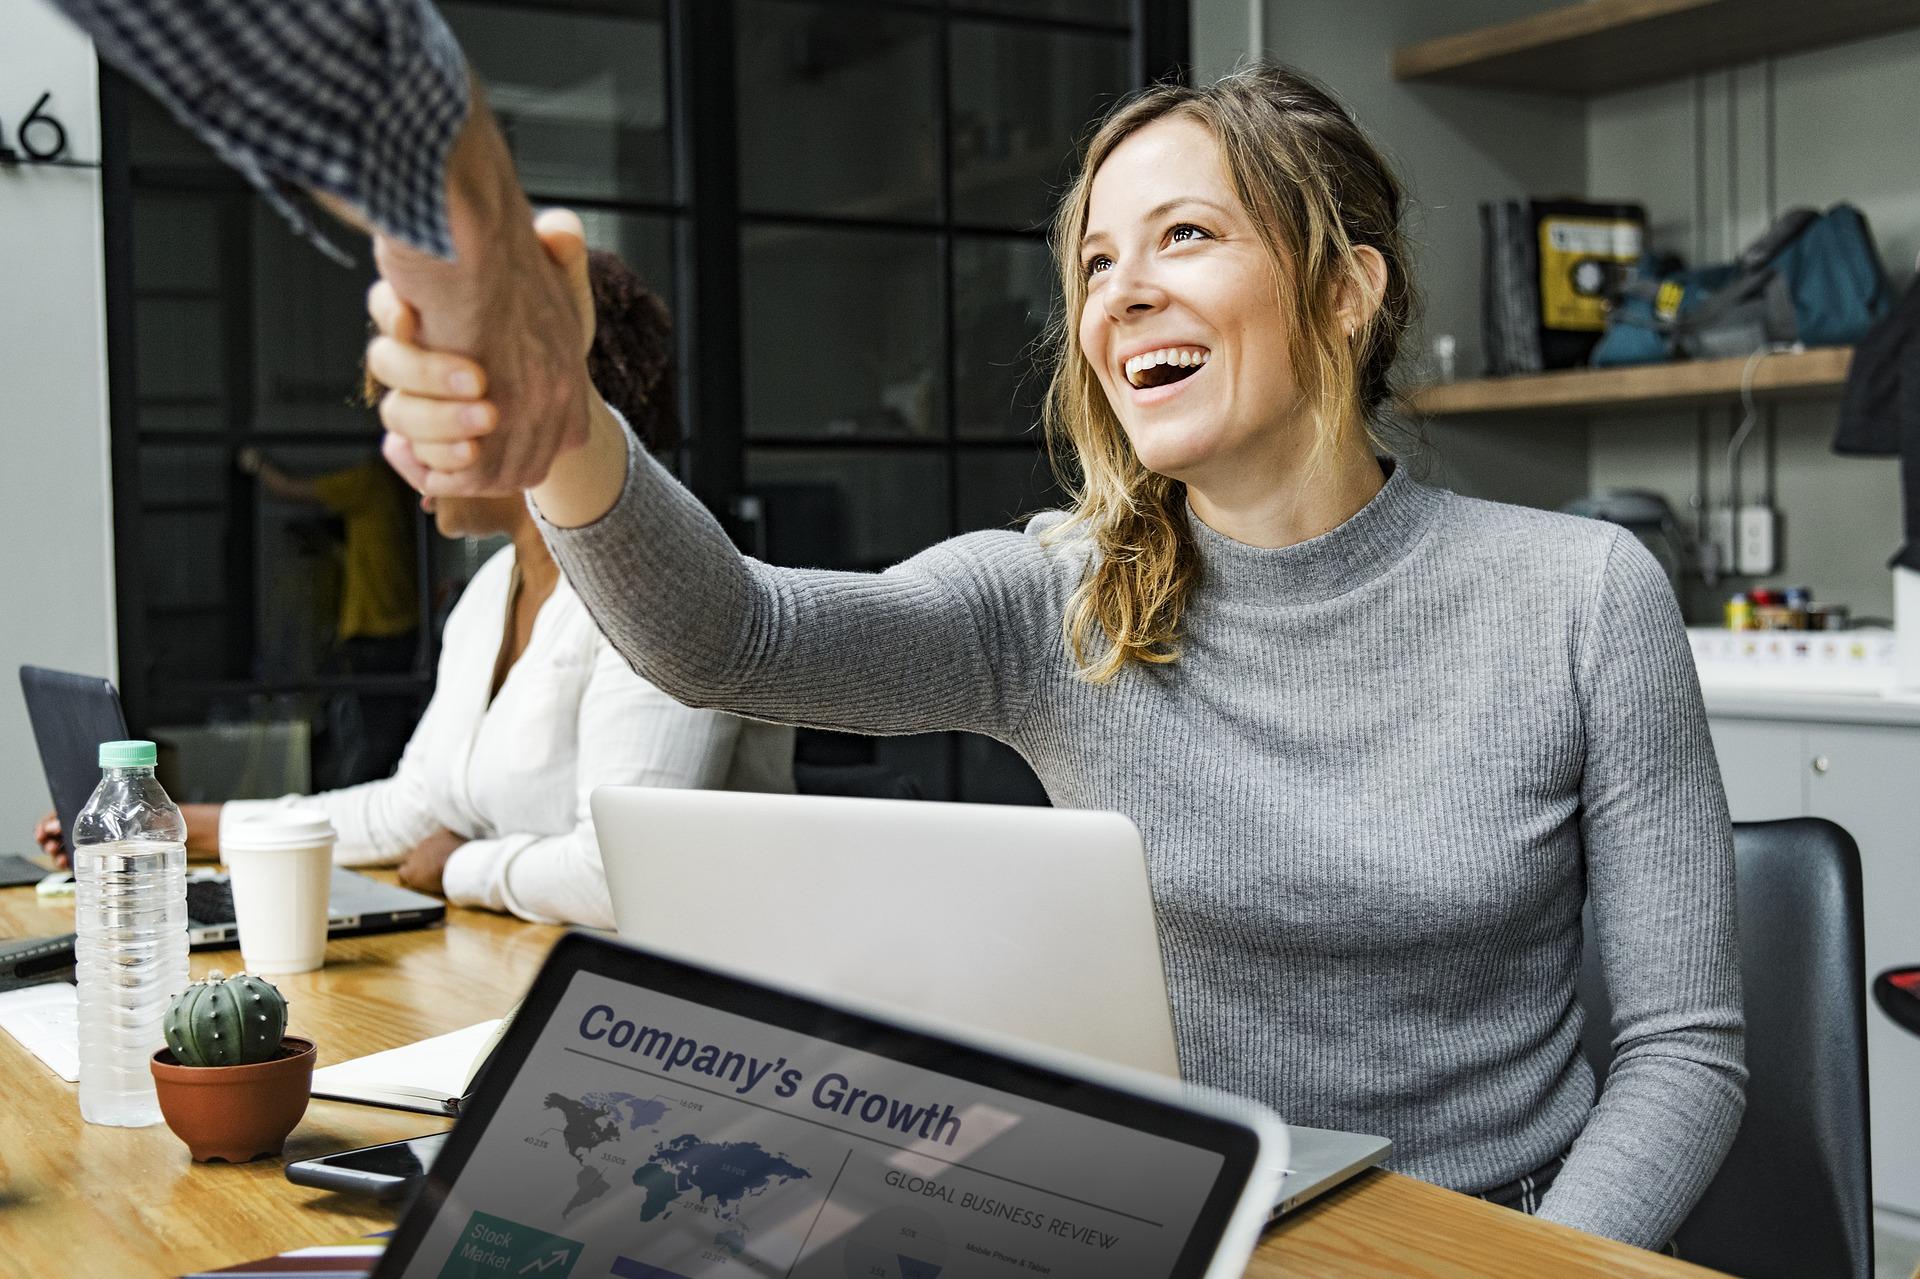 woman congratulating